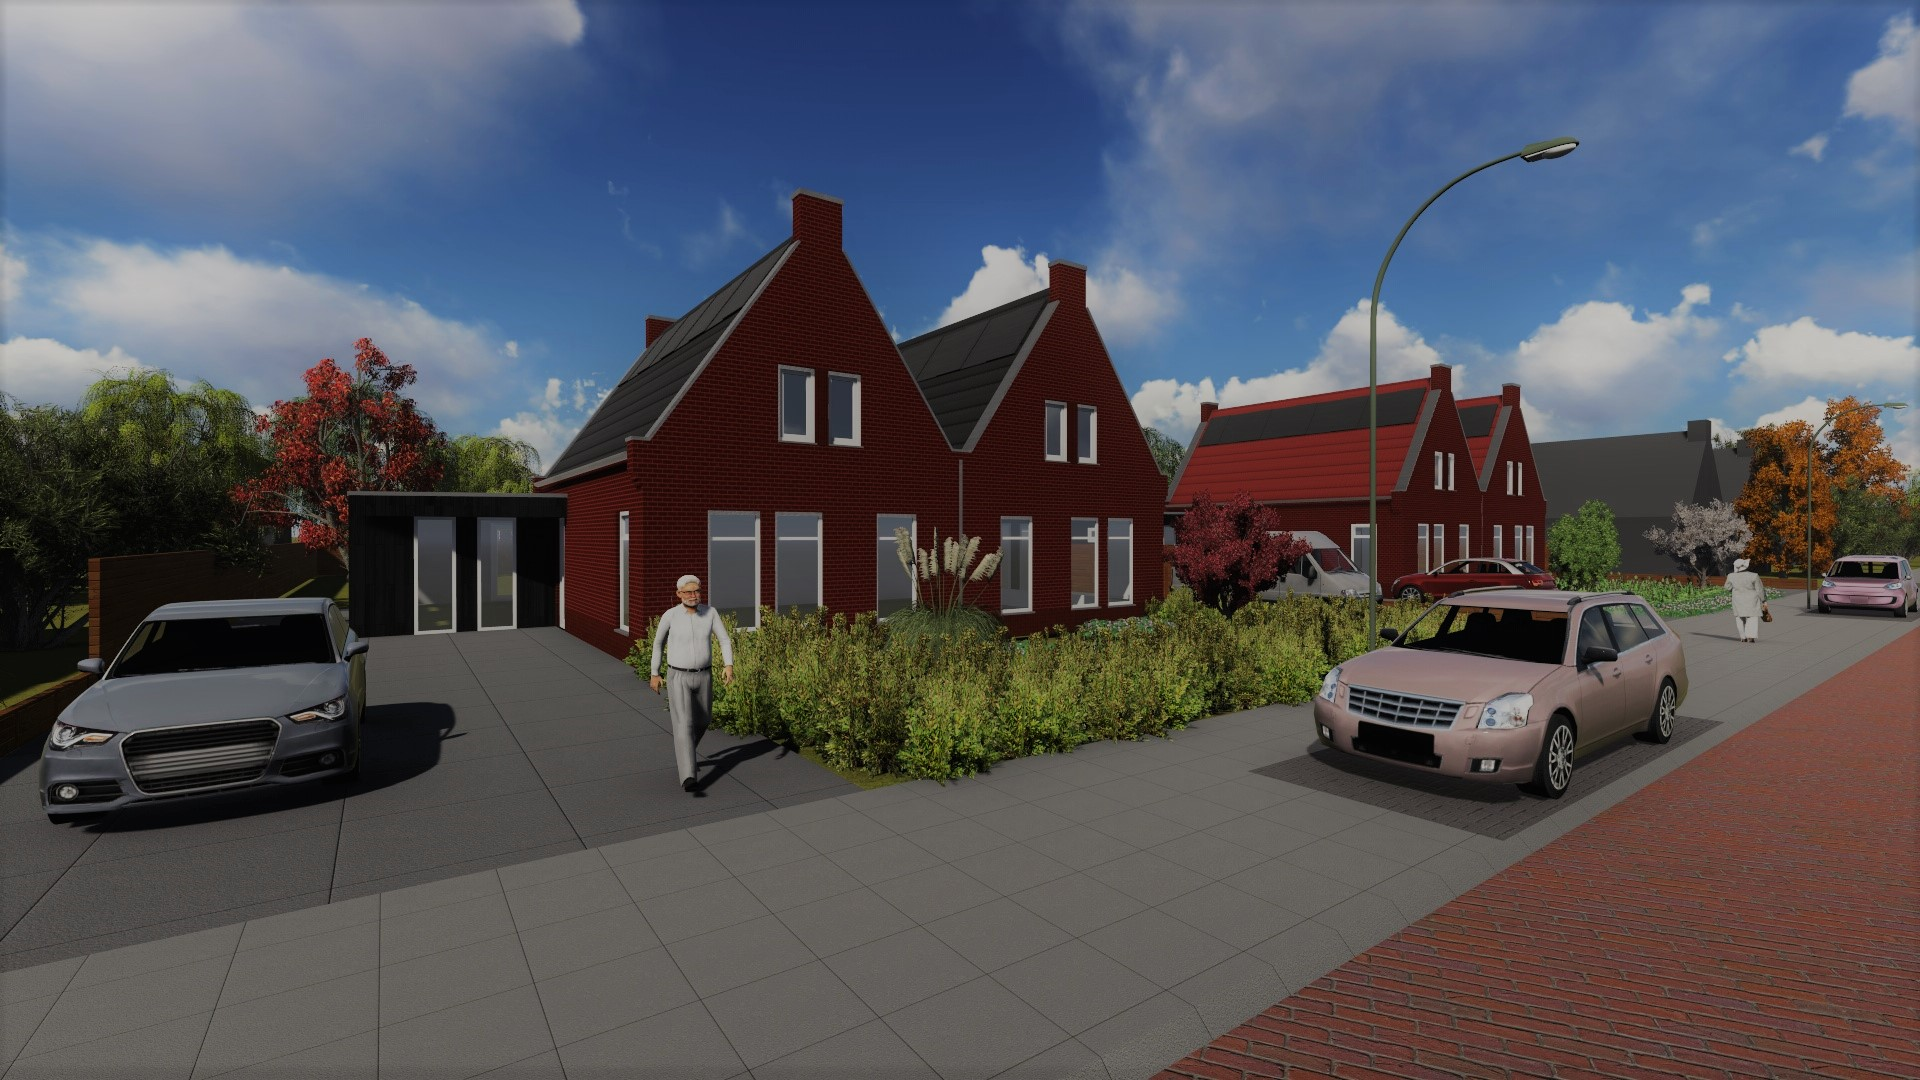 Aankomende zaterdag open huizen dag bouwbedrijf for Bouwbedrijf huizen